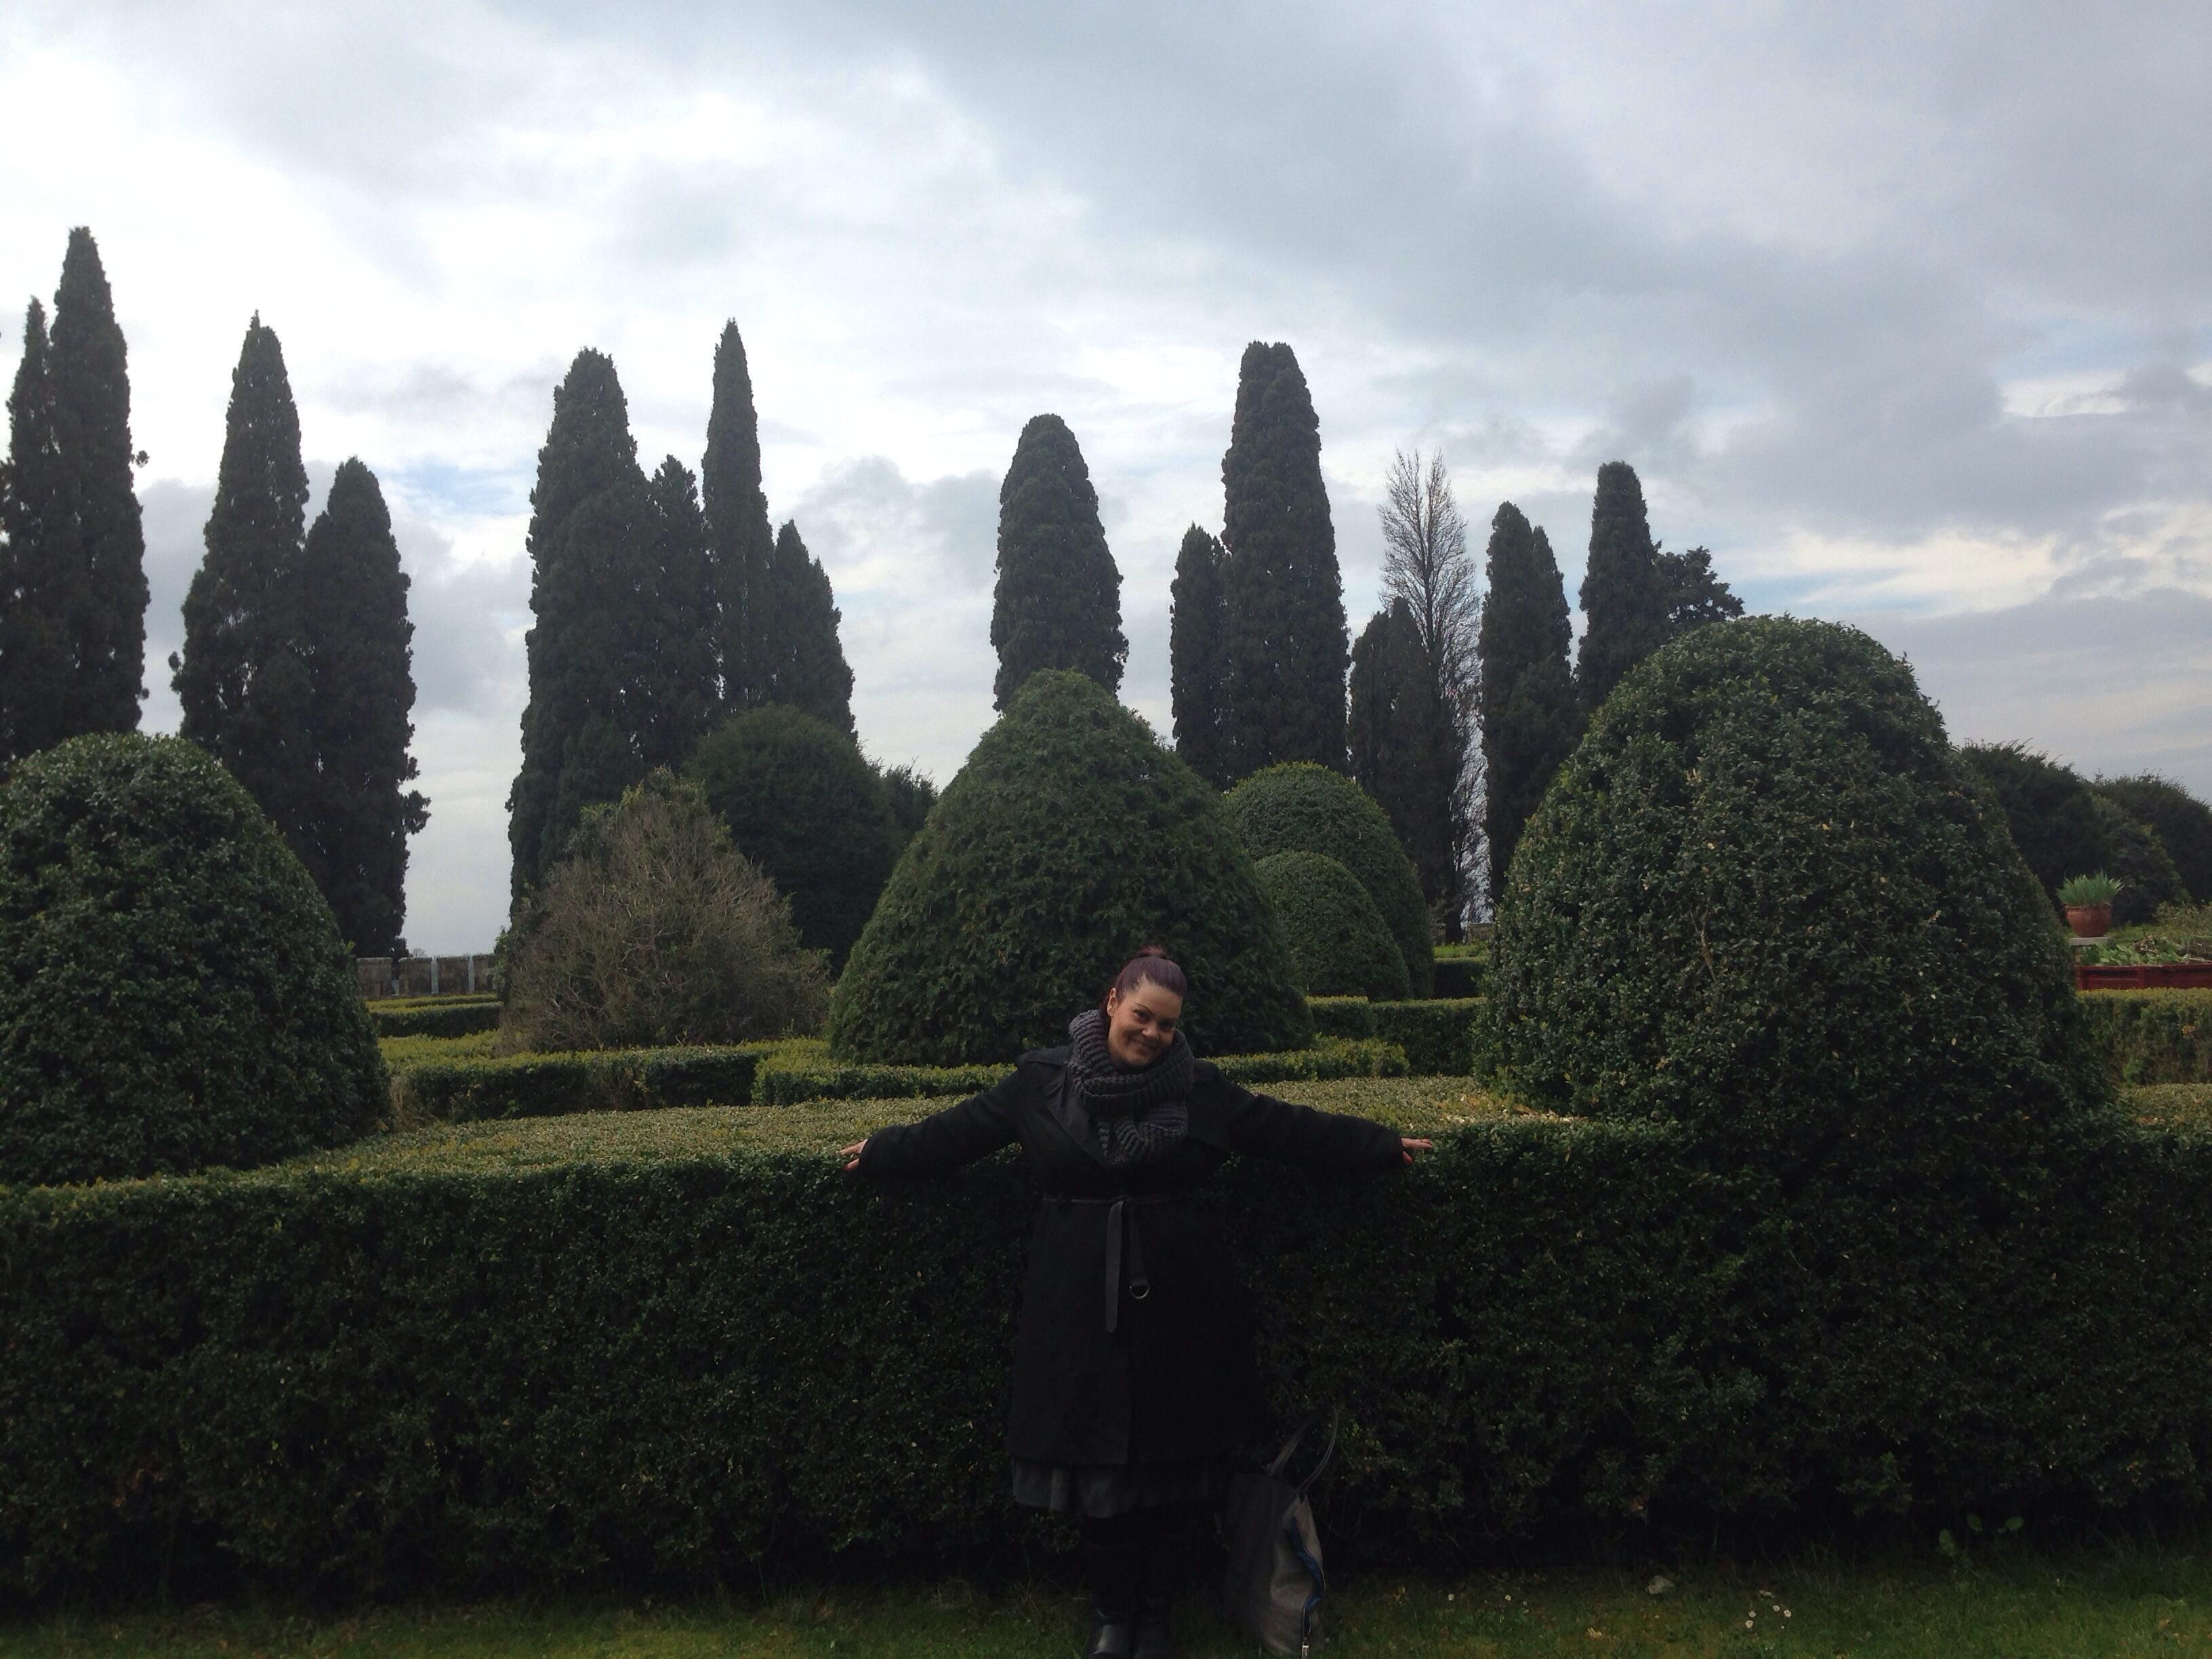 Think Tuscany, think green...